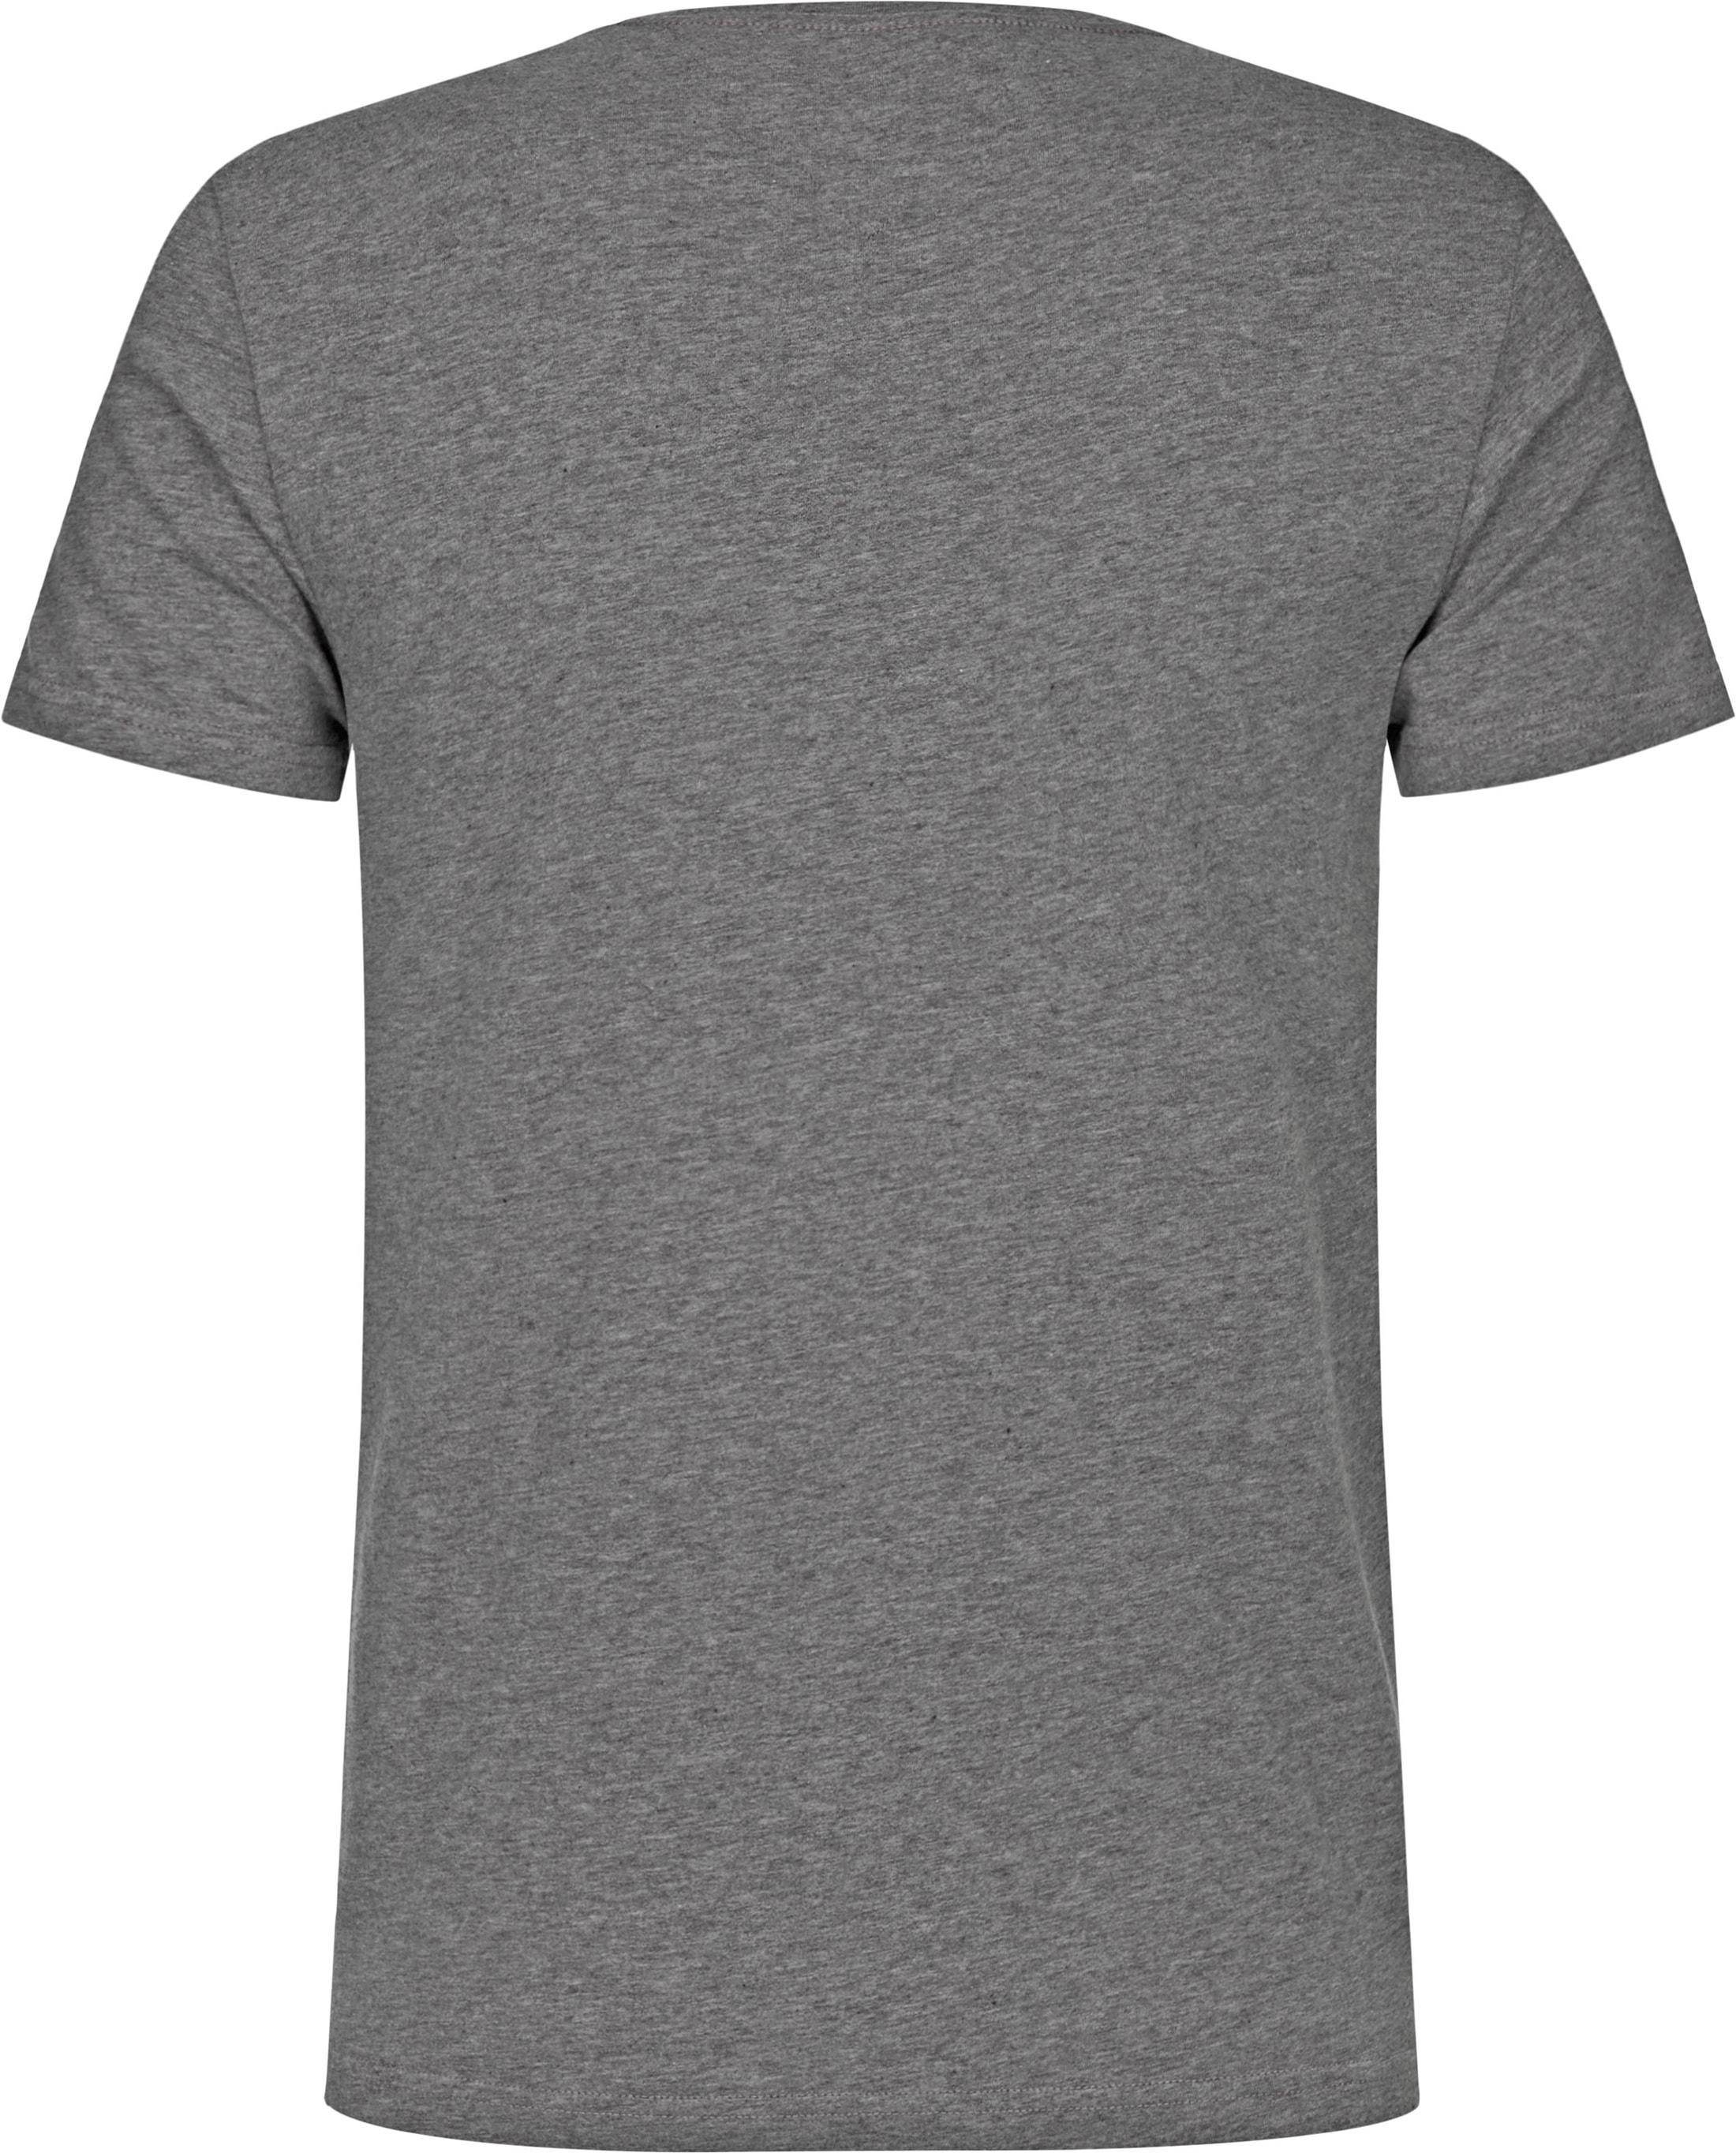 Tommy Hilfiger T-shirt College Grijs foto 1